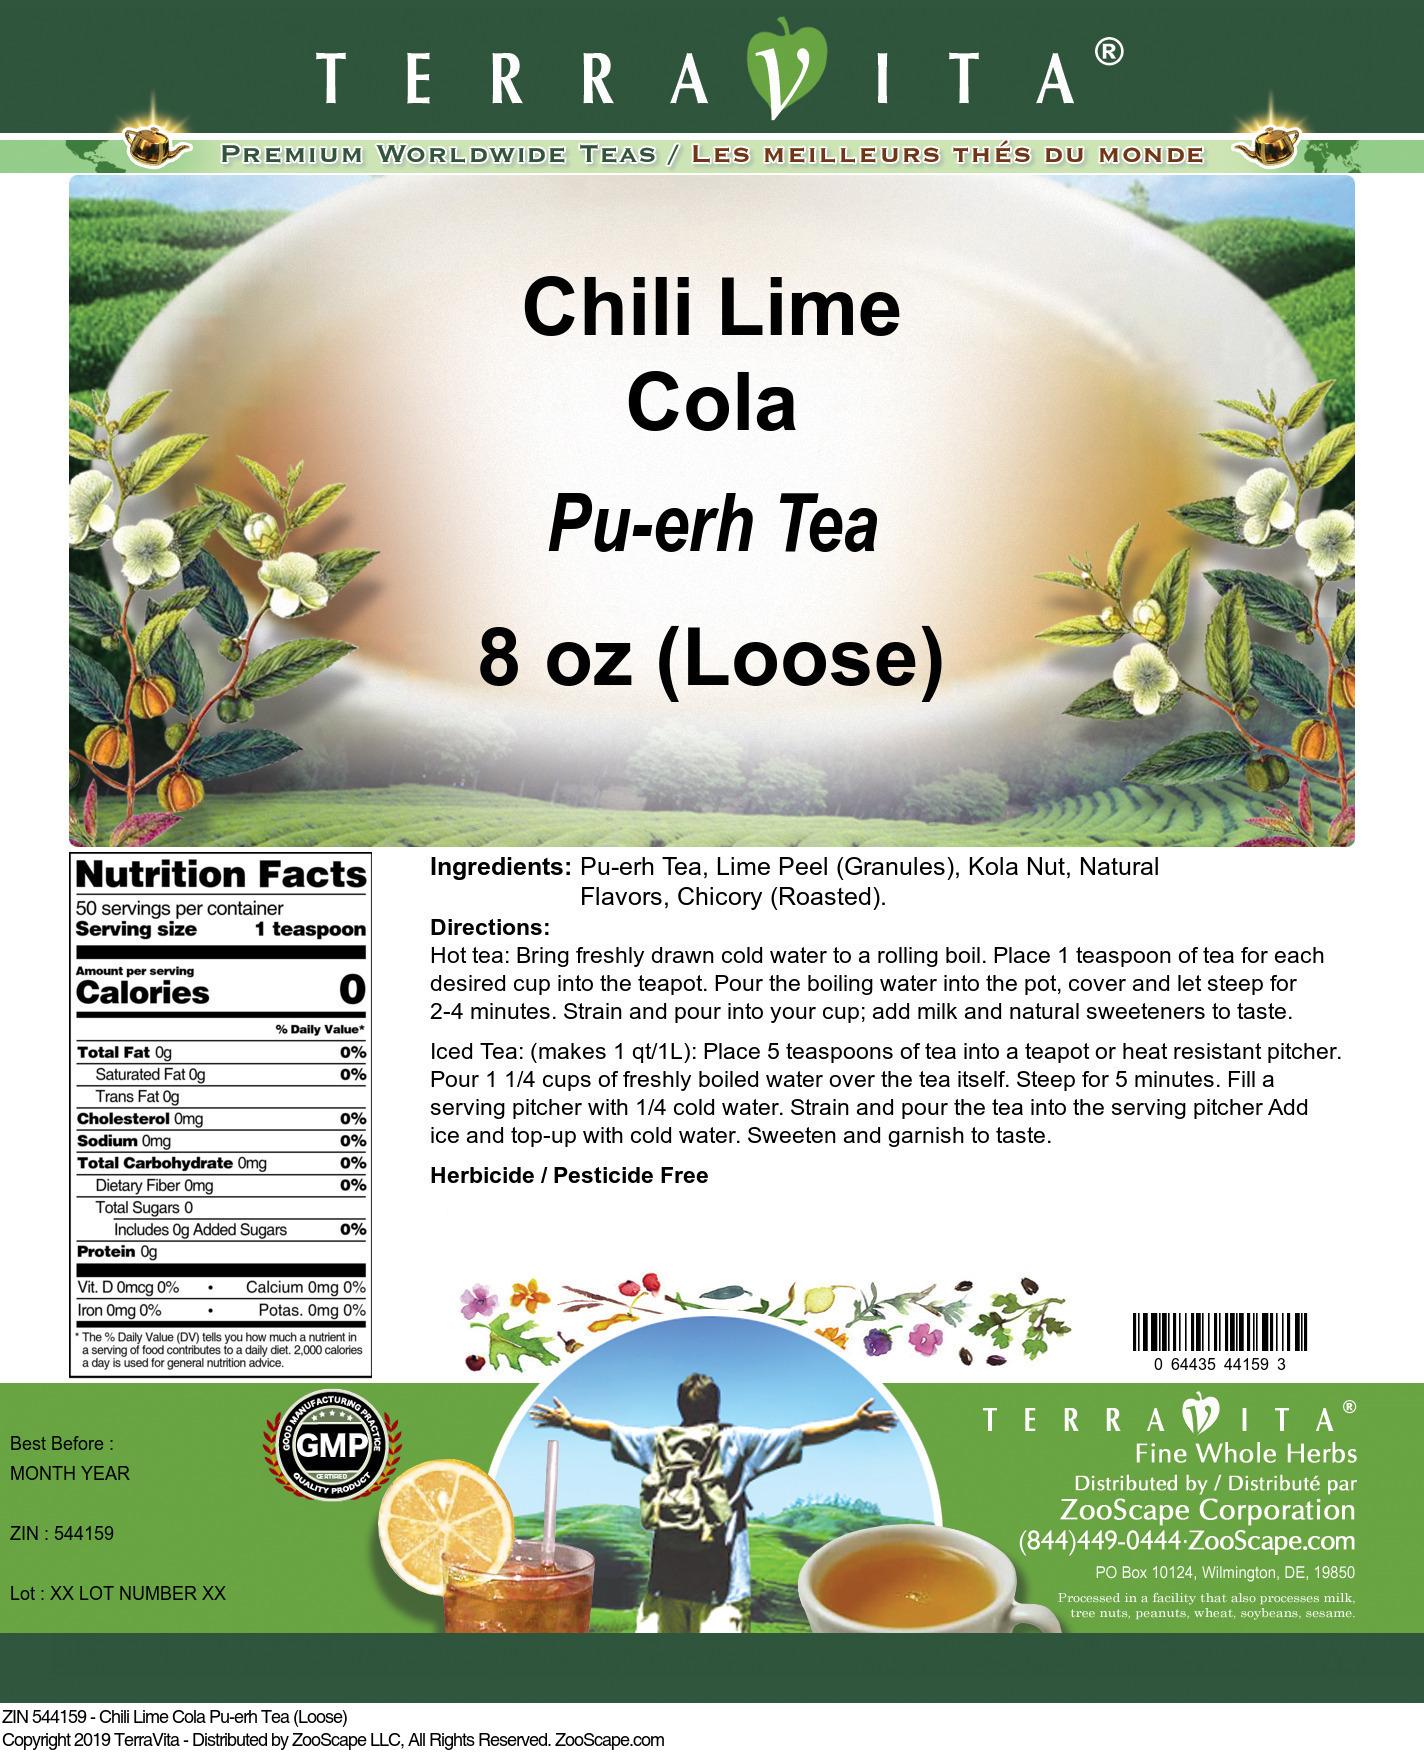 Chili Lime Cola Pu-erh Tea (Loose)